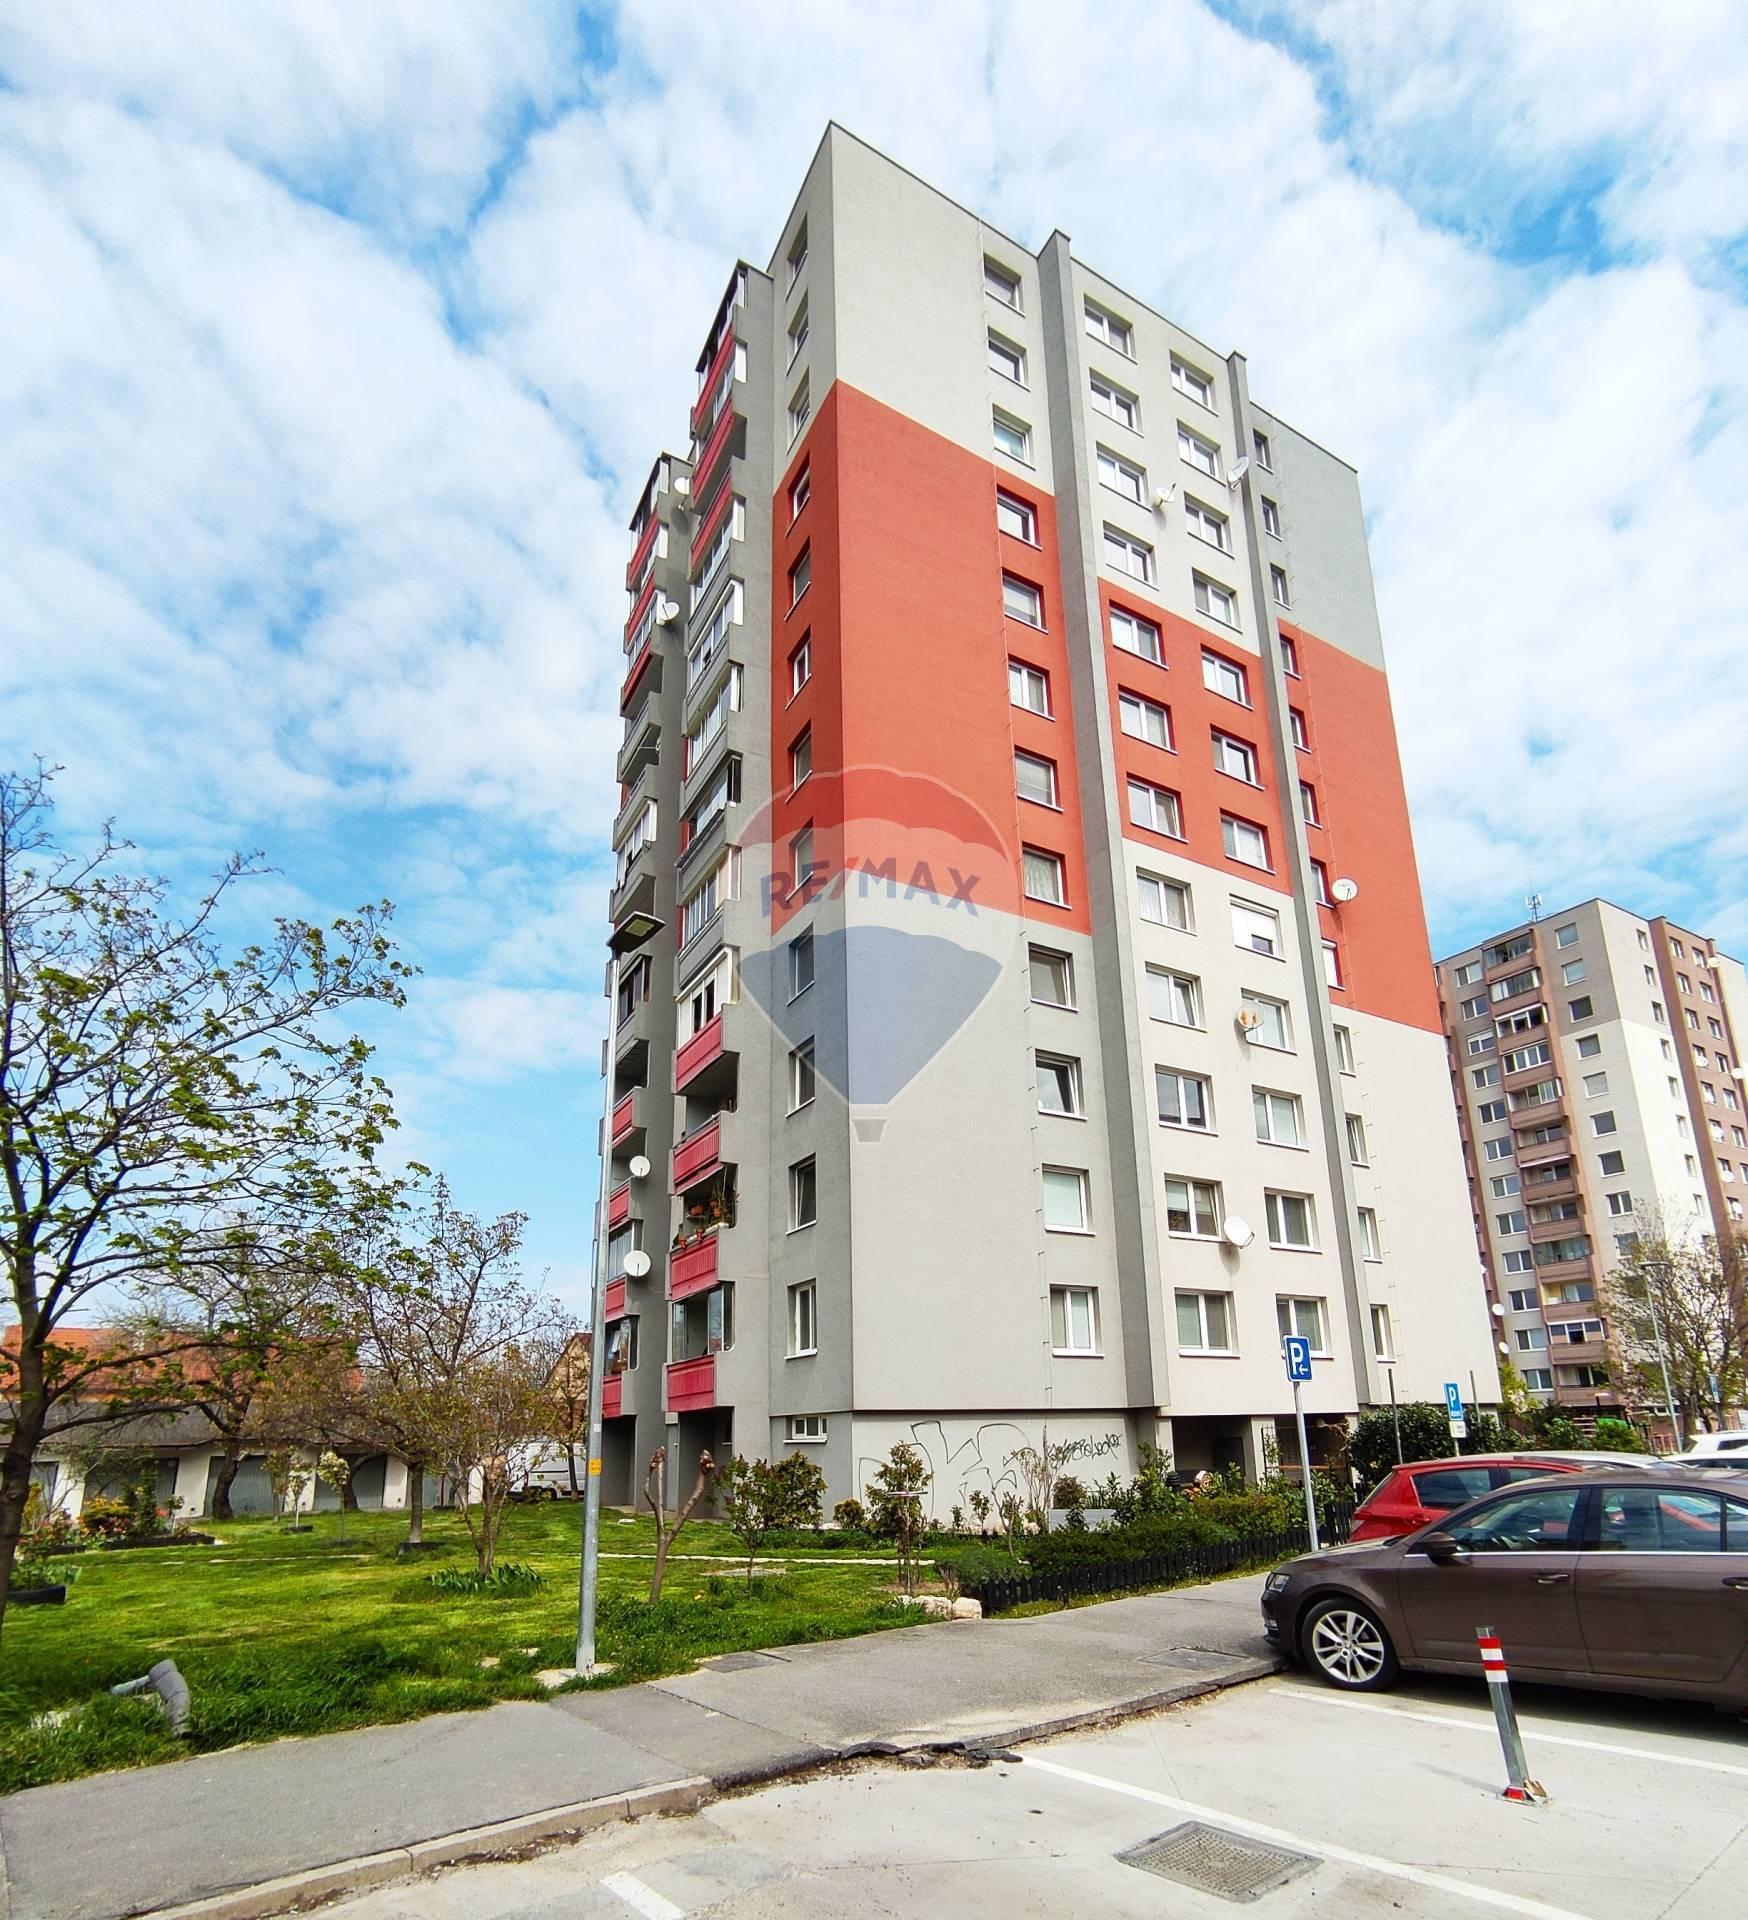 Predaj 3 izb. byt, 70,8 m2, lodžia 3,8m2, centrum - Jesenského ul., Senec